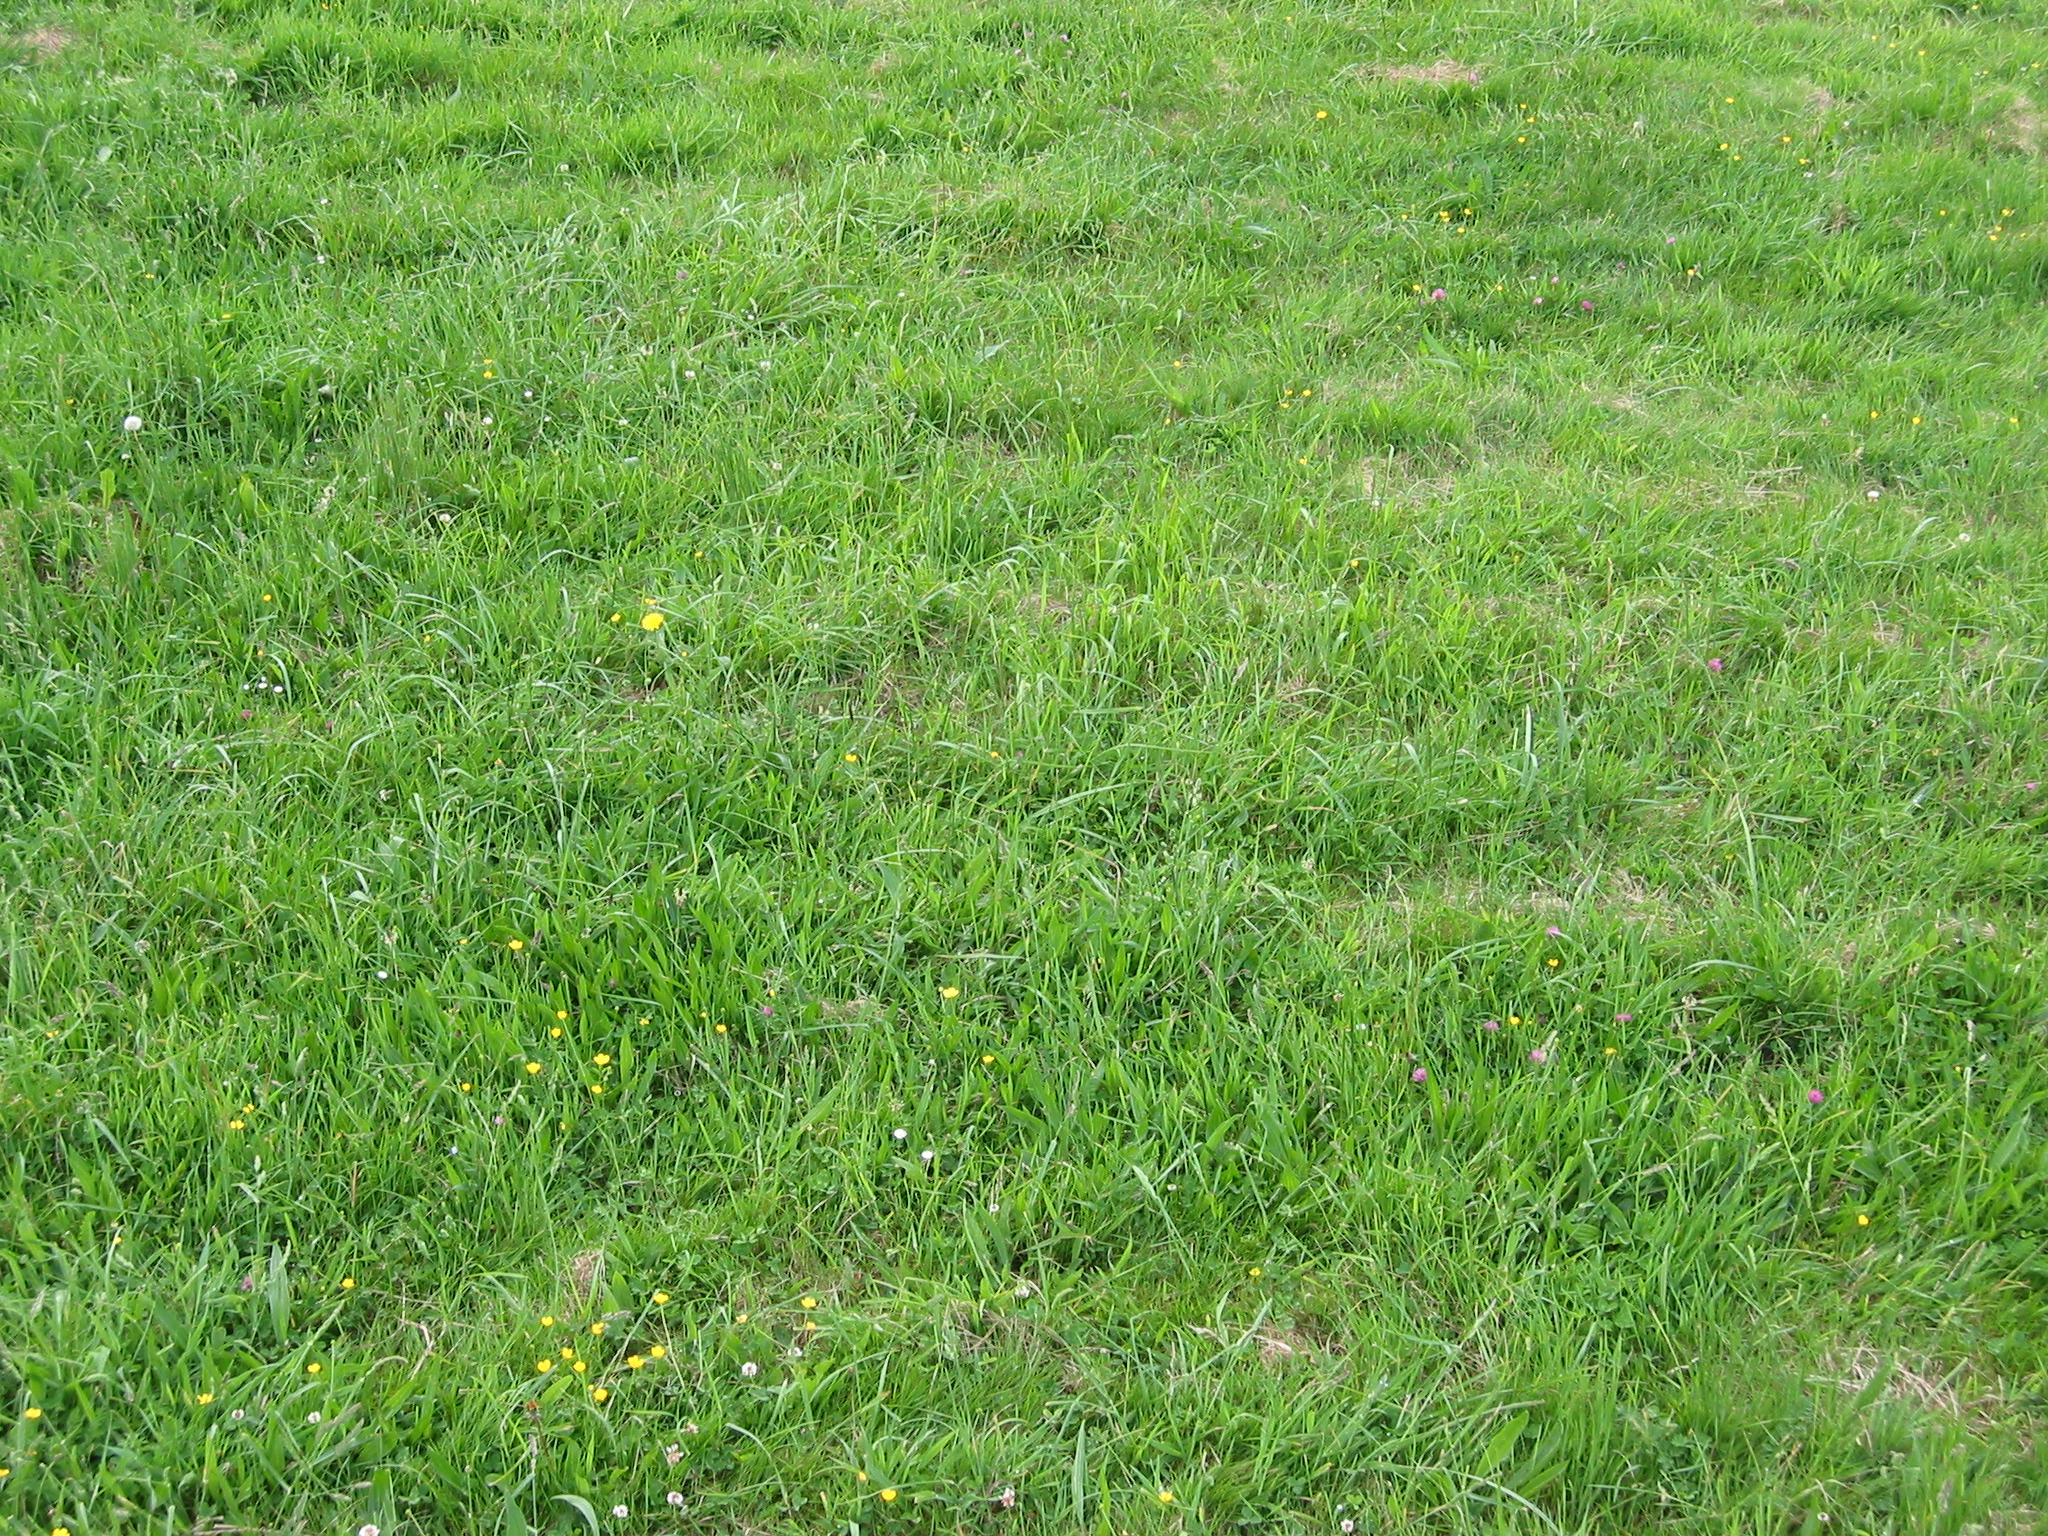 Grass Landscape Landscape grass by marc31 on deviantart landscape grass by marc31 landscape grass by marc31 workwithnaturefo